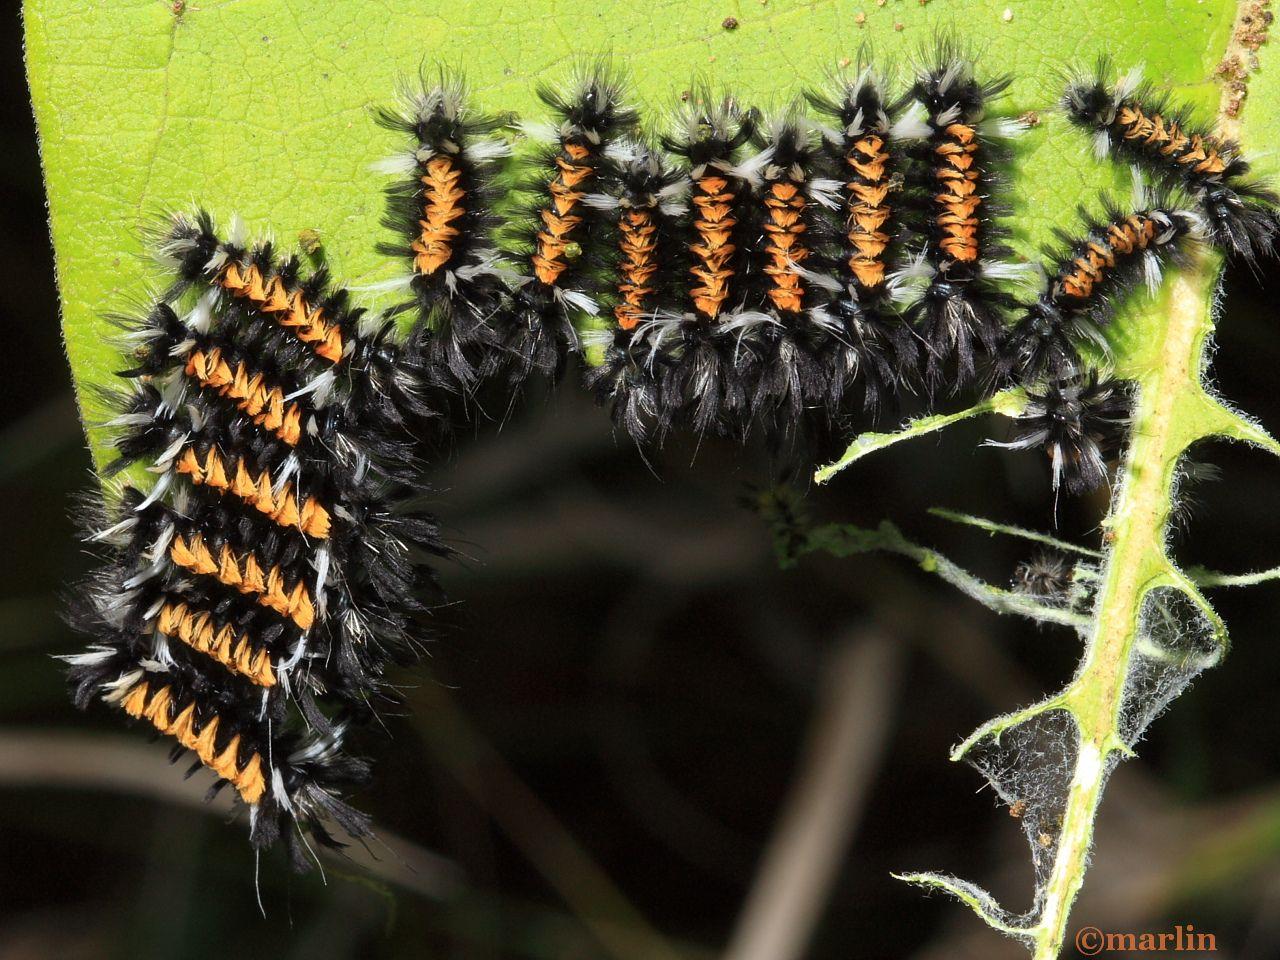 Milkweed tussock moth caterpillars gregarious feeding